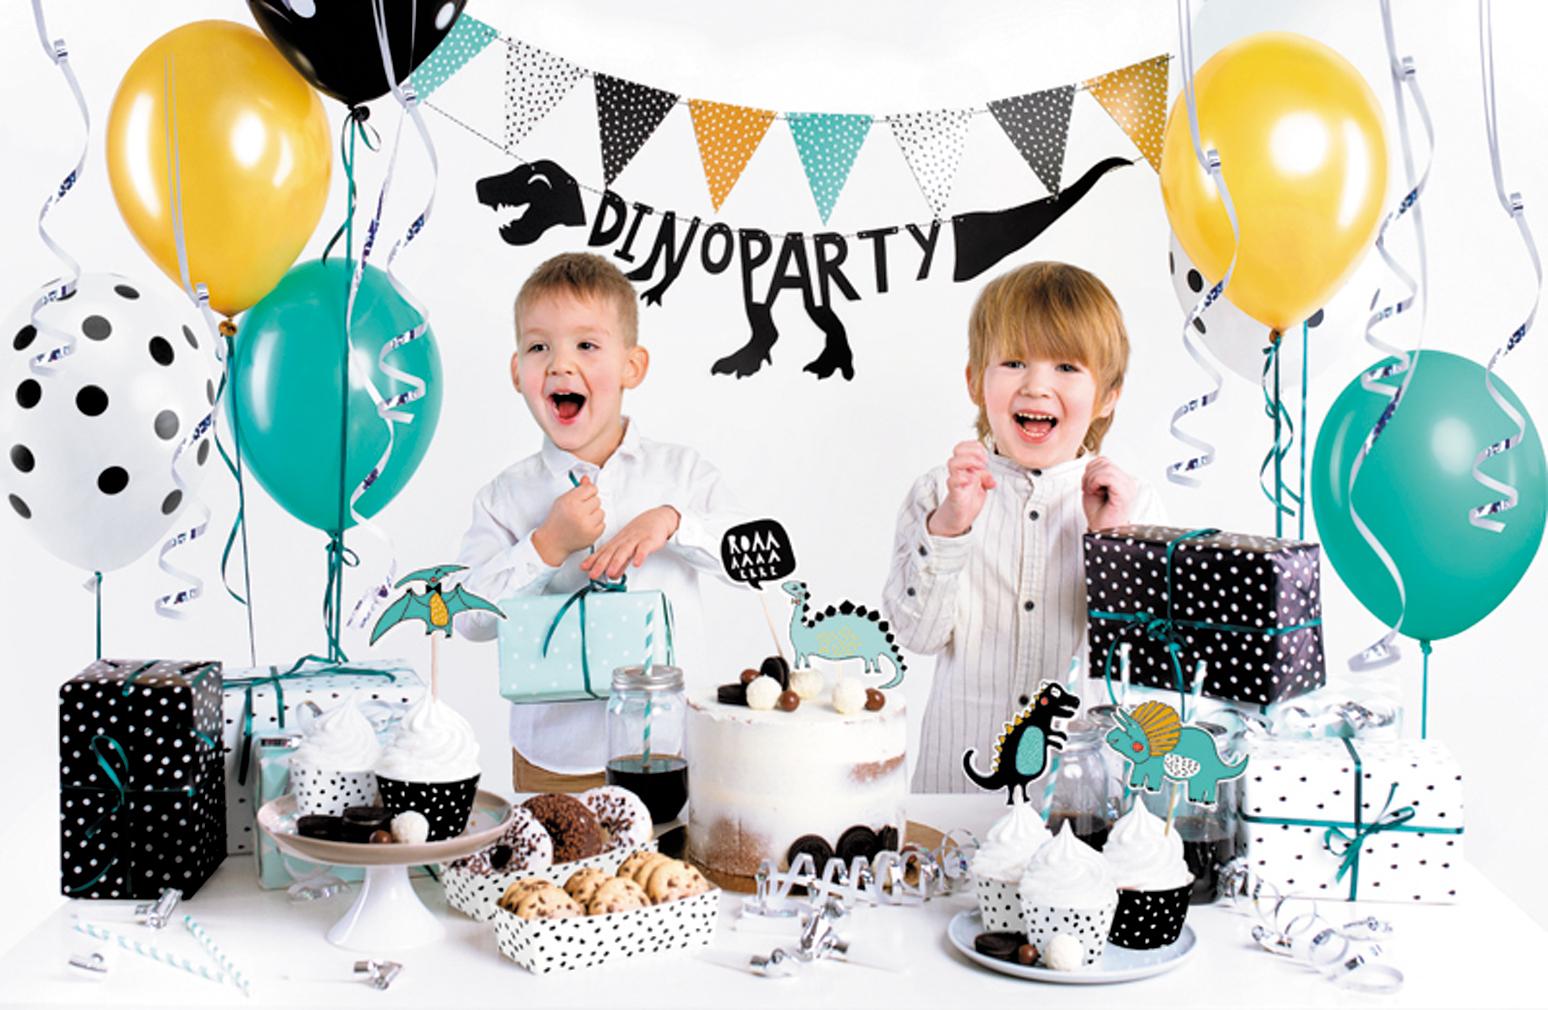 Geburtstag Set Dino Party Kindergeburtstag Geburtstagsparty